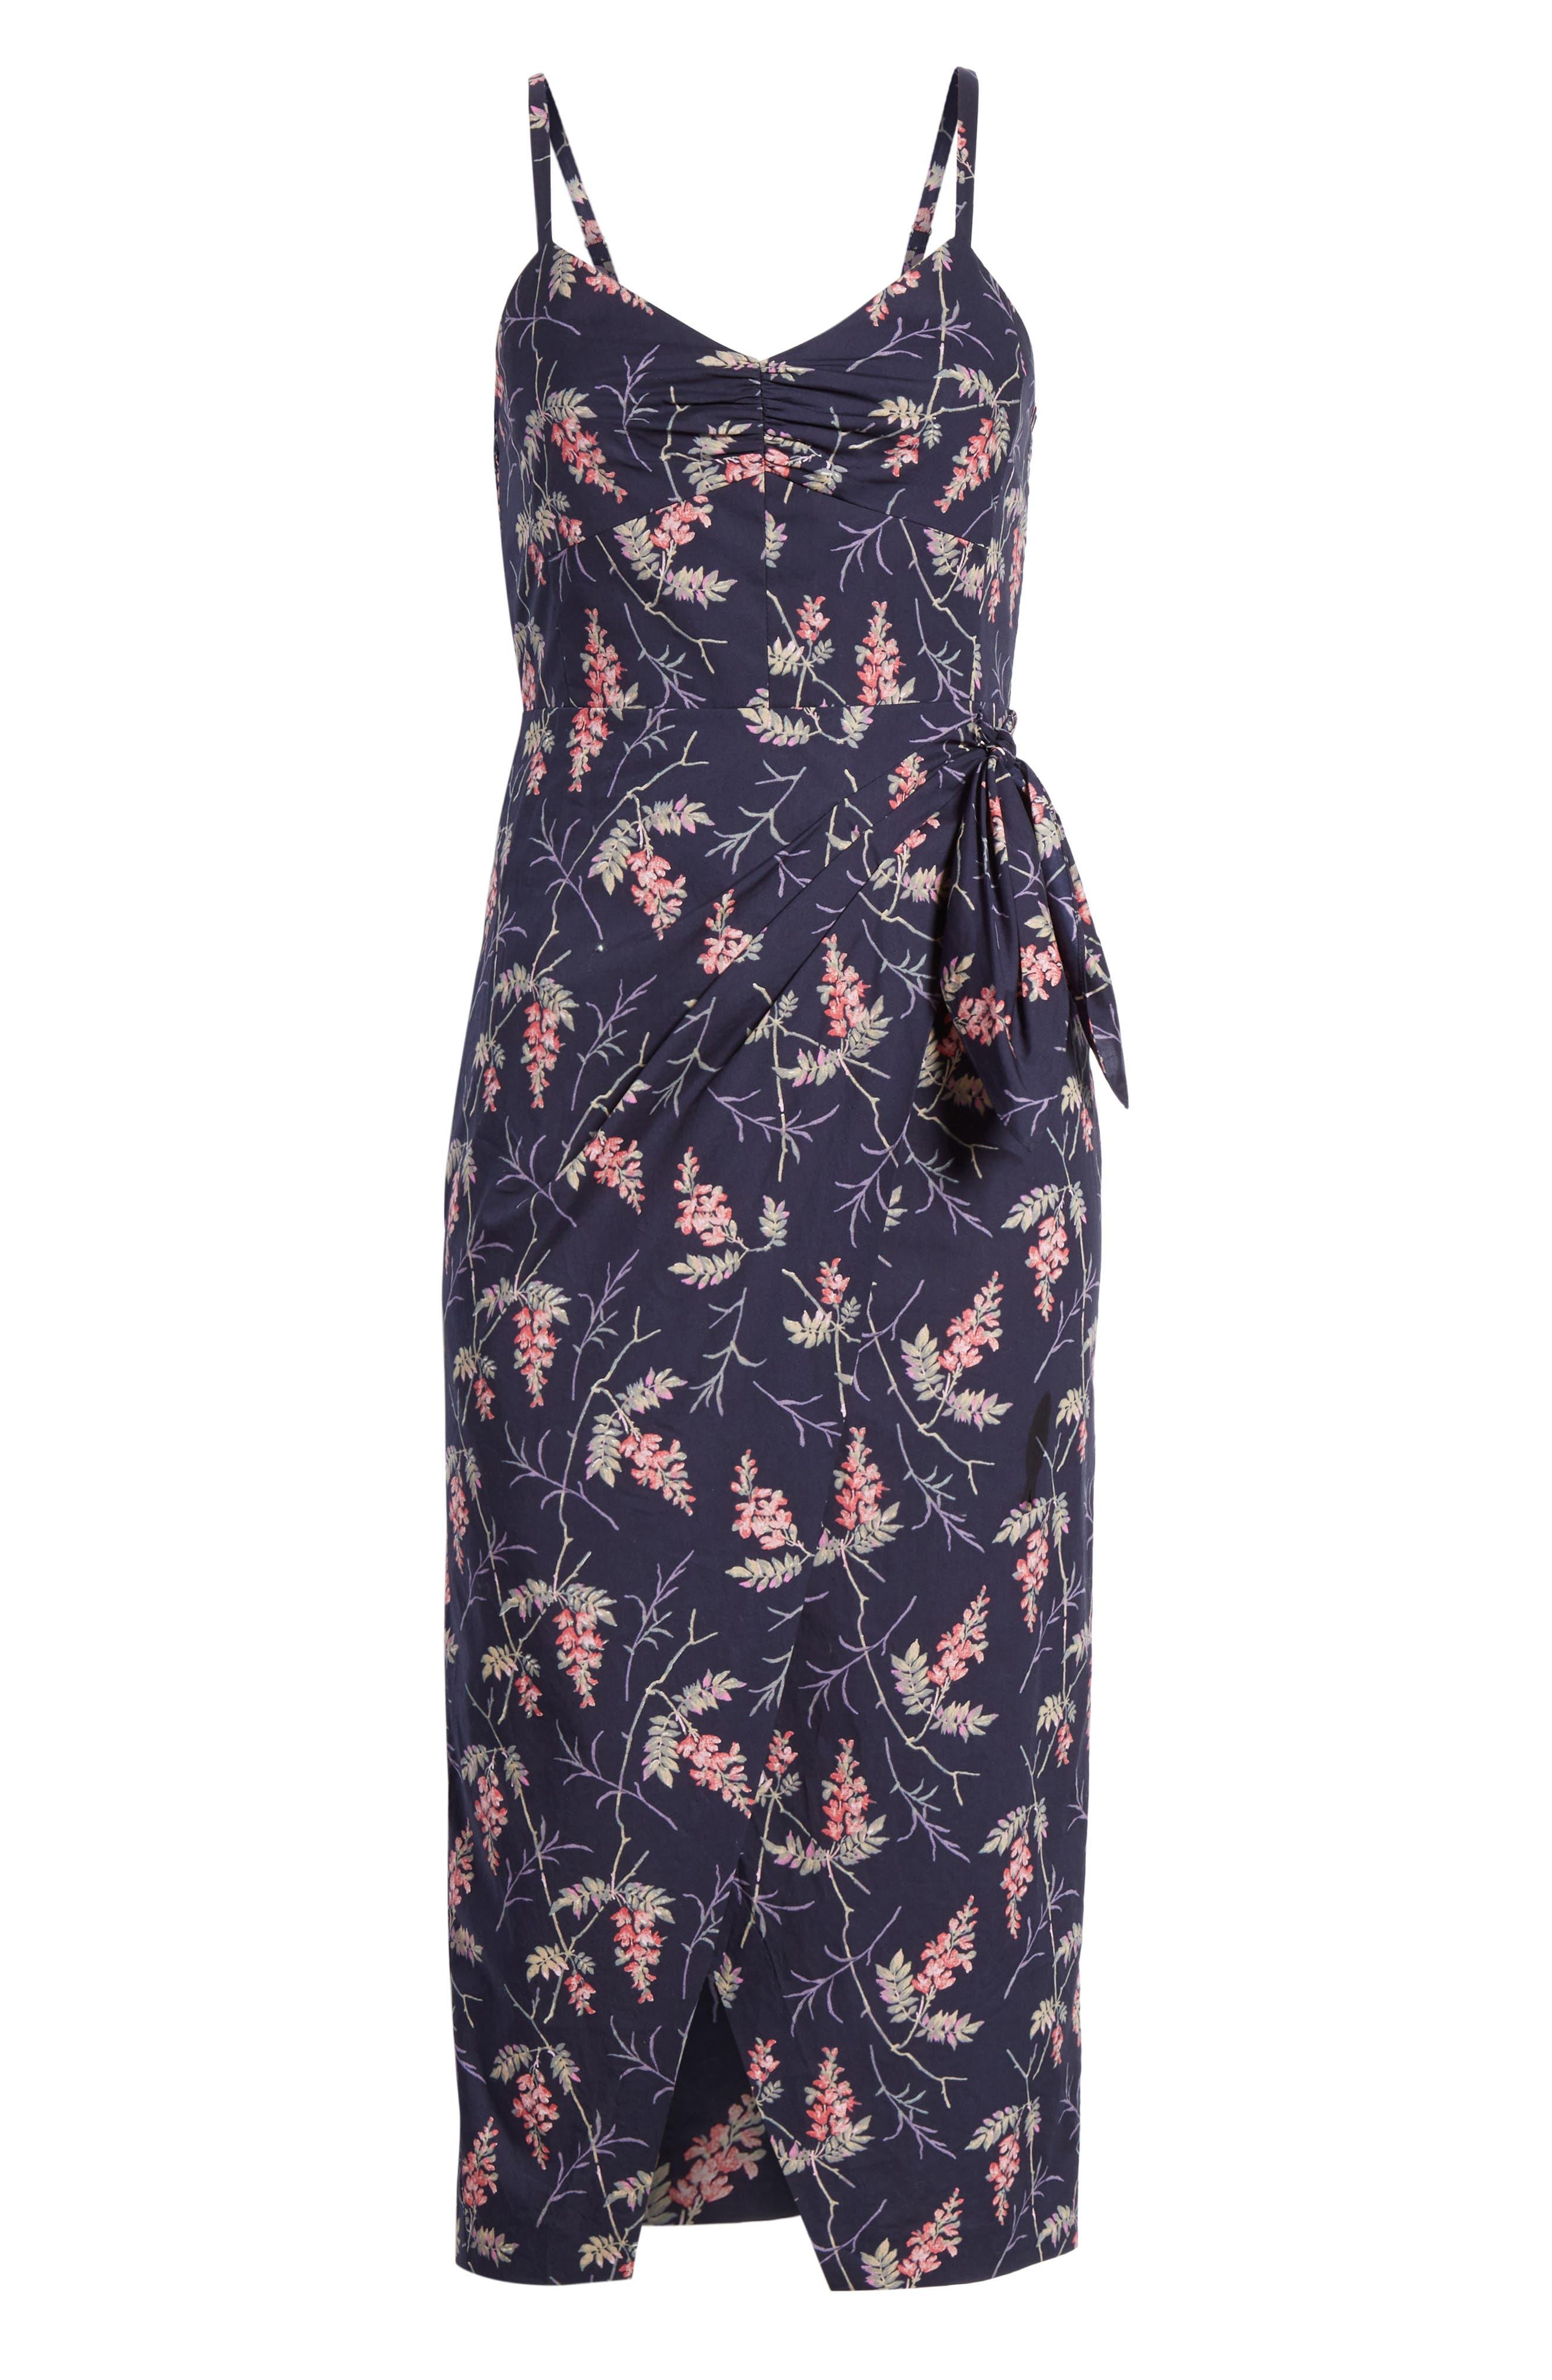 REBECCA TAYLOR, Ivie Floral Sleeveless Cotton Midi Sundress, Alternate thumbnail 7, color, NAVY COMBO